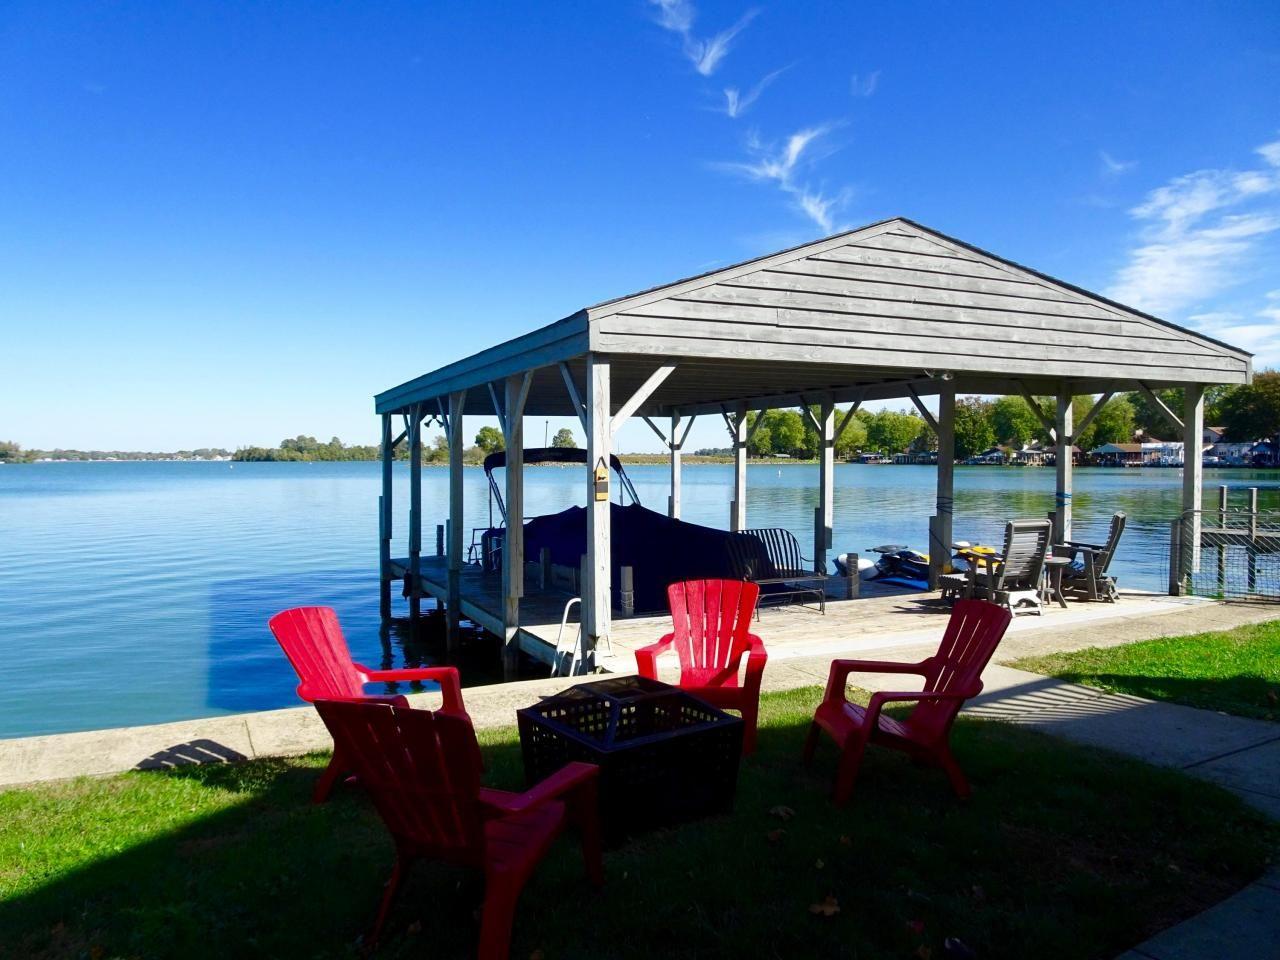 buckeye lake boat rentals columbus ohio